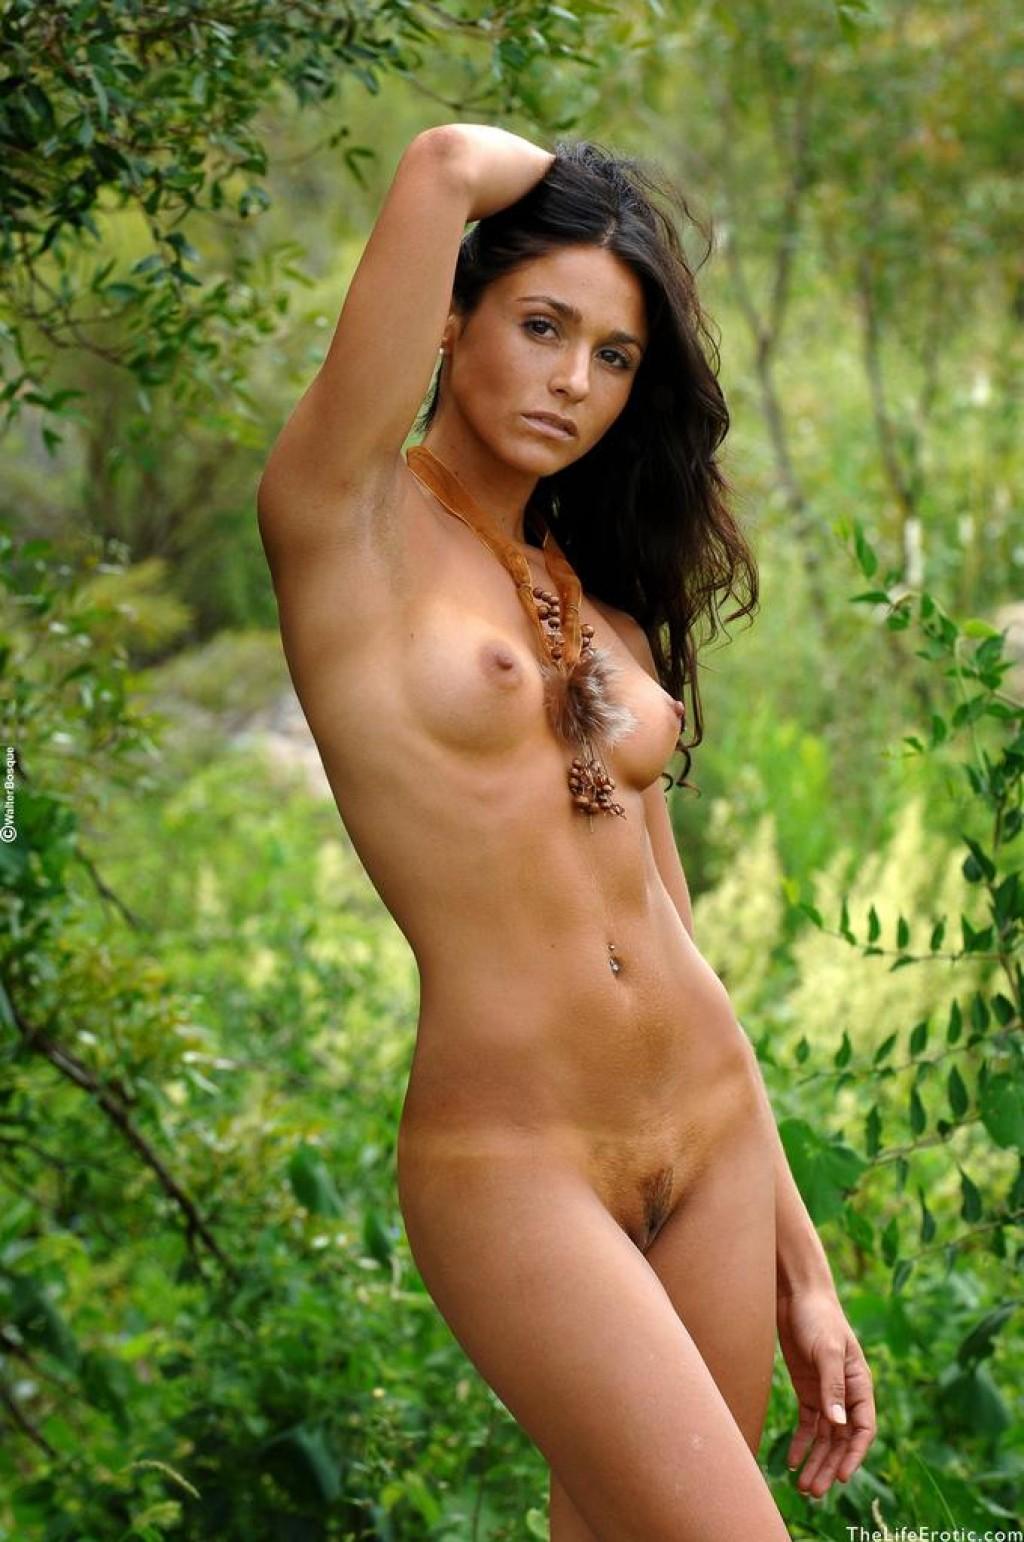 Martina In In The Jungle For Thelifeerotic At Thenudeeu-7585